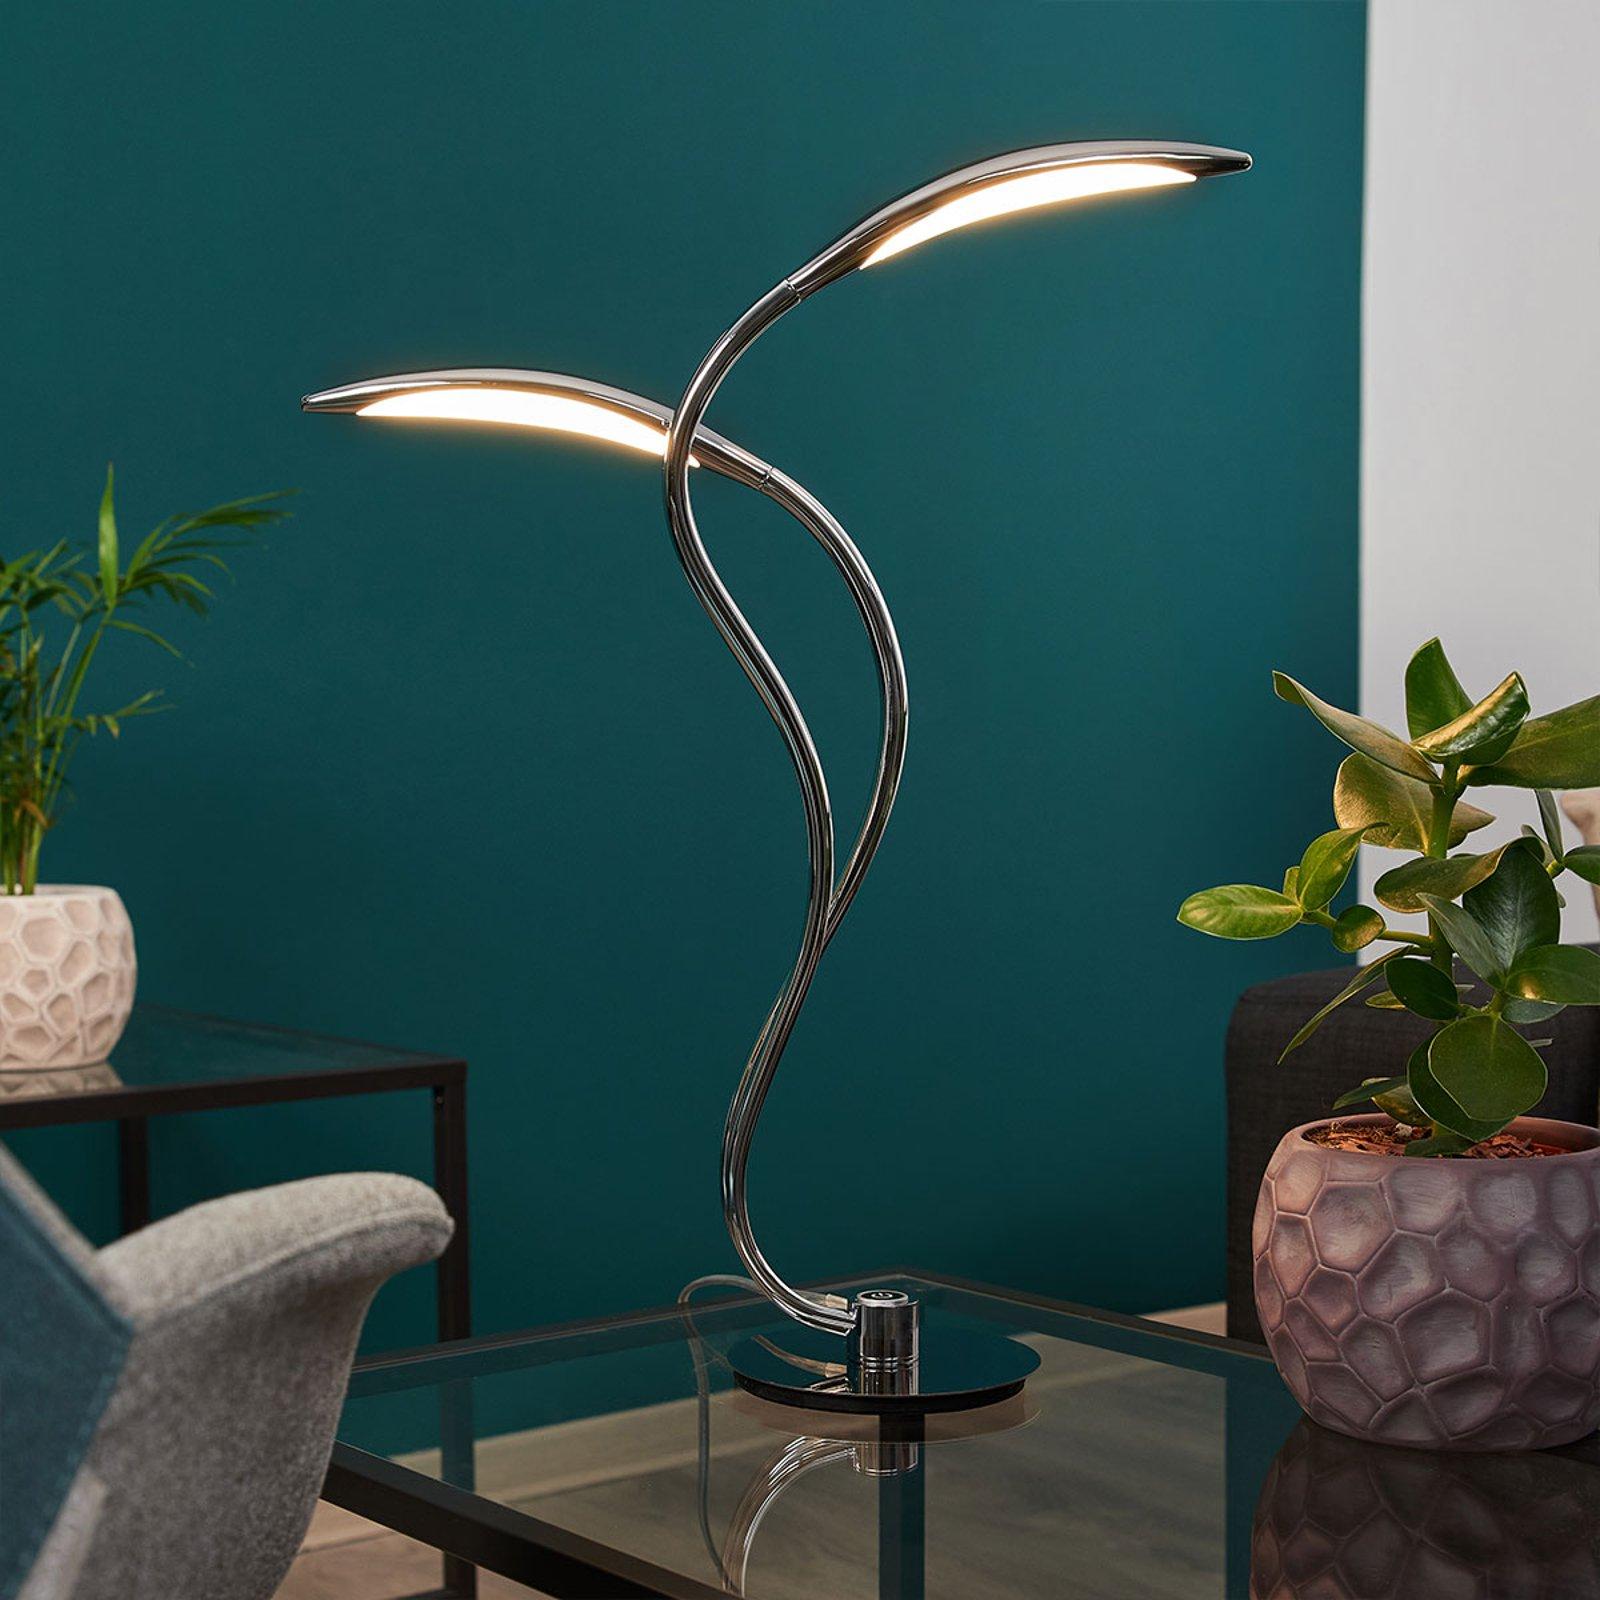 LED-bordlampe Hampton med buet utforming